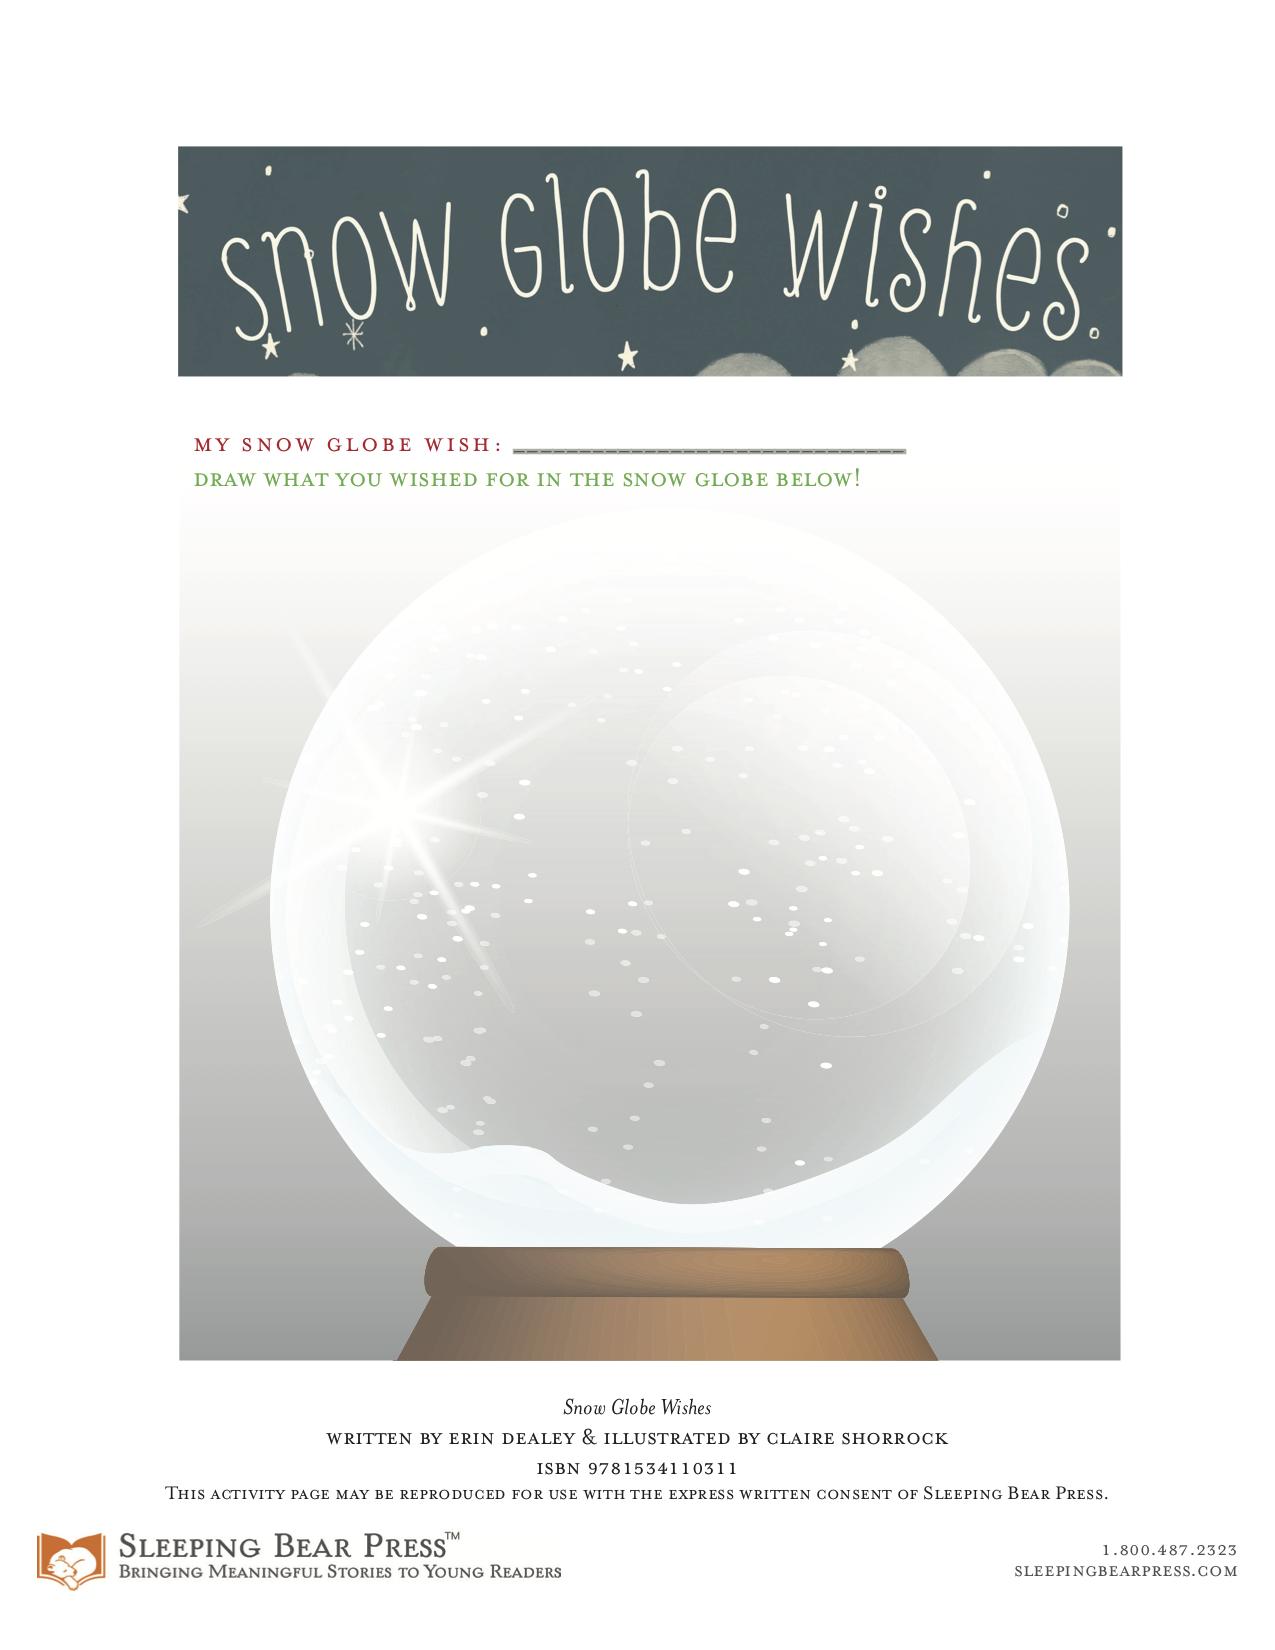 Snow Globe Wishes Activity Sheet from Sleeping Bear Press